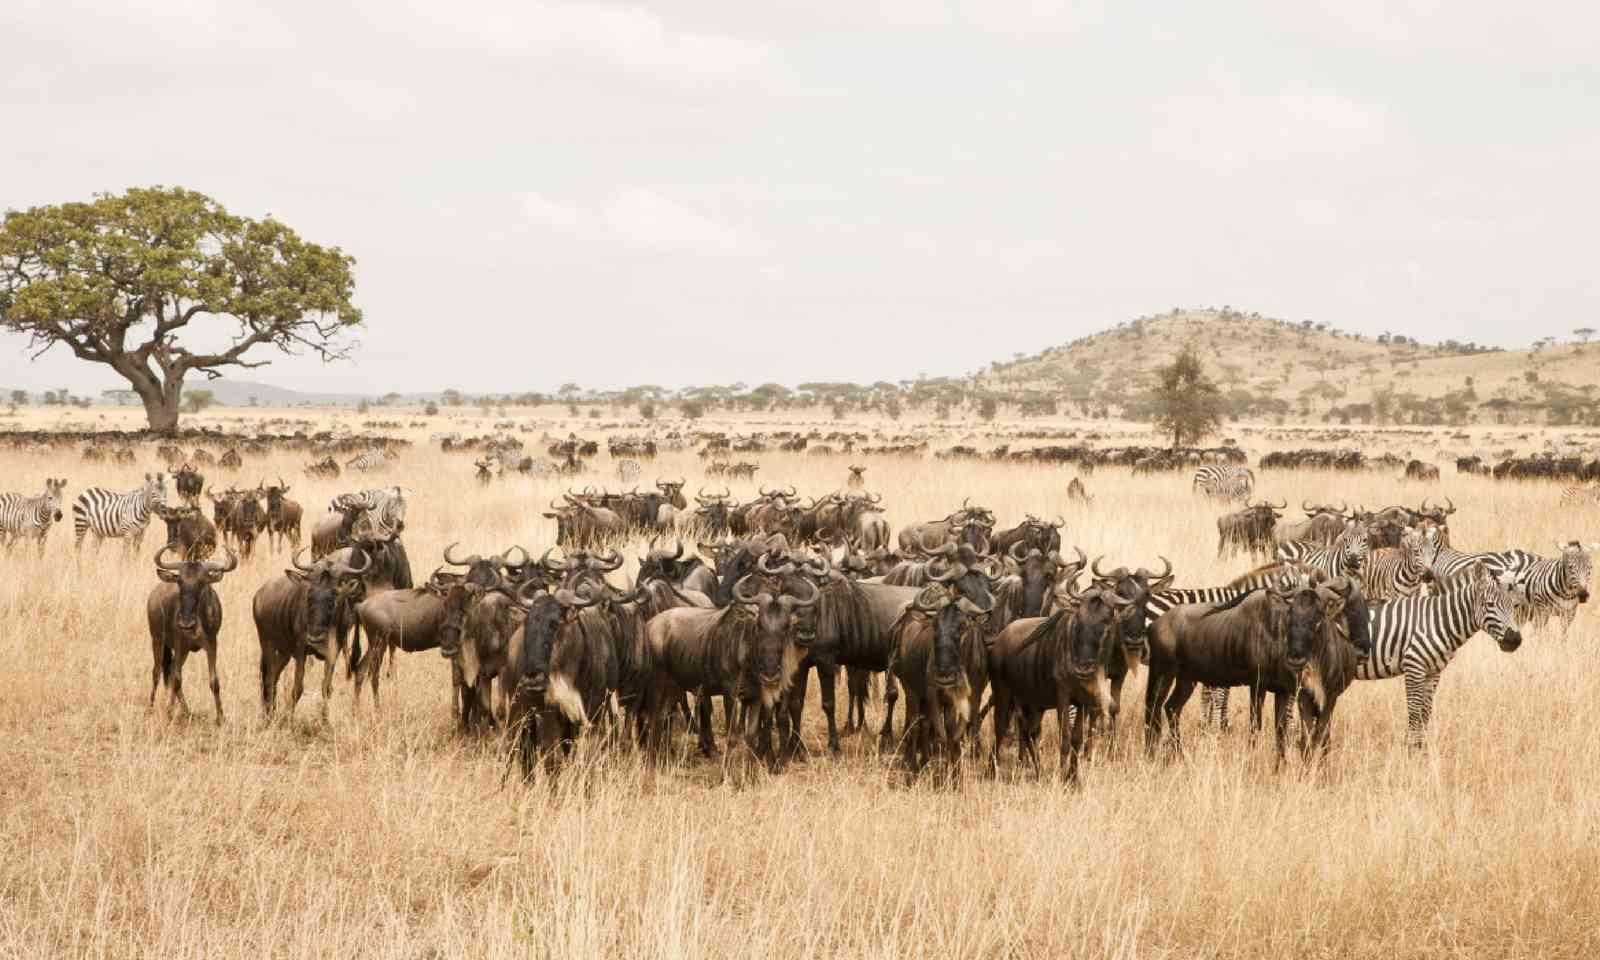 Seronera, Serengeti National Park, Tanzania (Shutterstock)